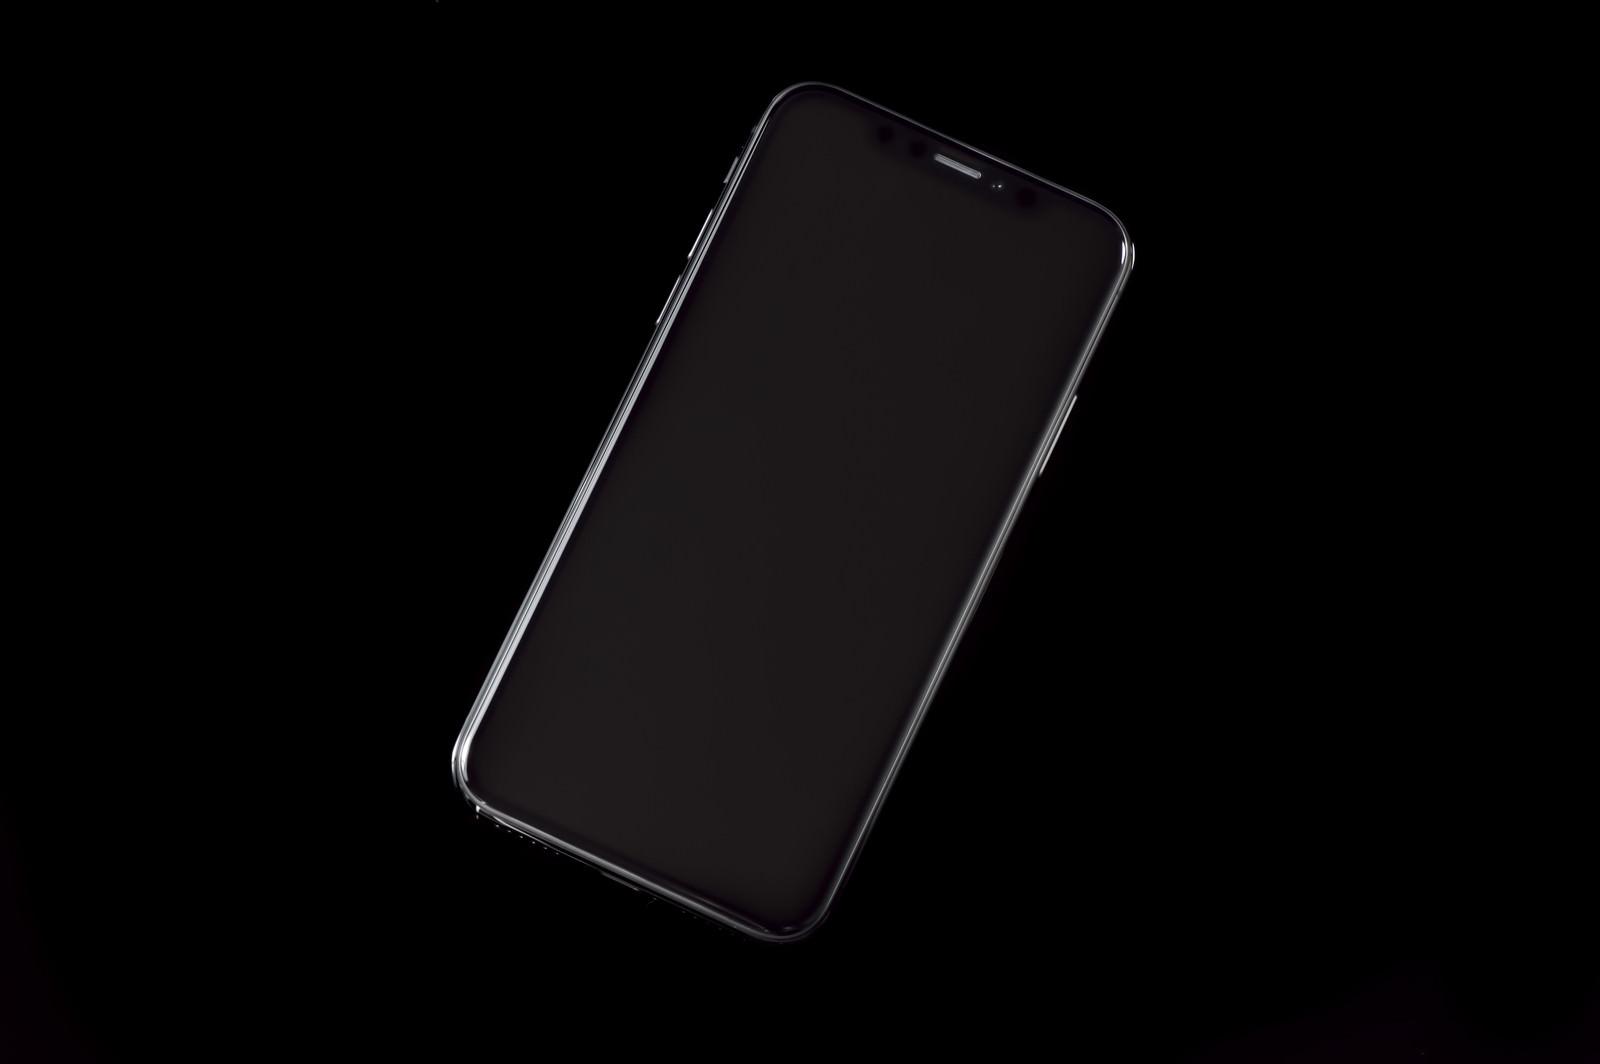 「iPhone X スペースグレイ(画面OFF)」の写真